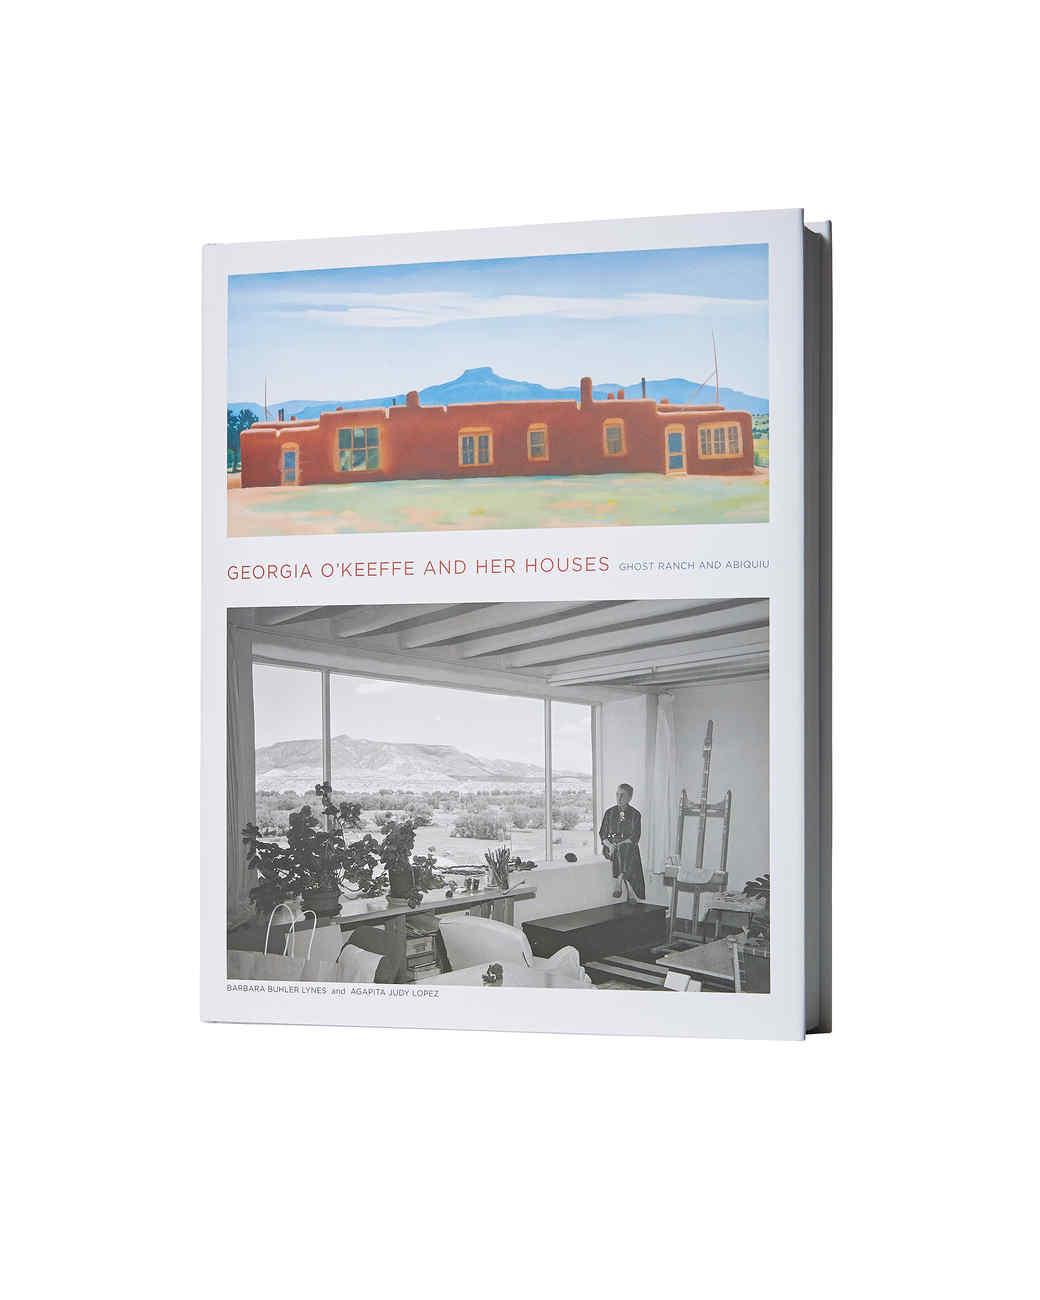 georgia-okeeffe-book-219-d112856_l.jpg